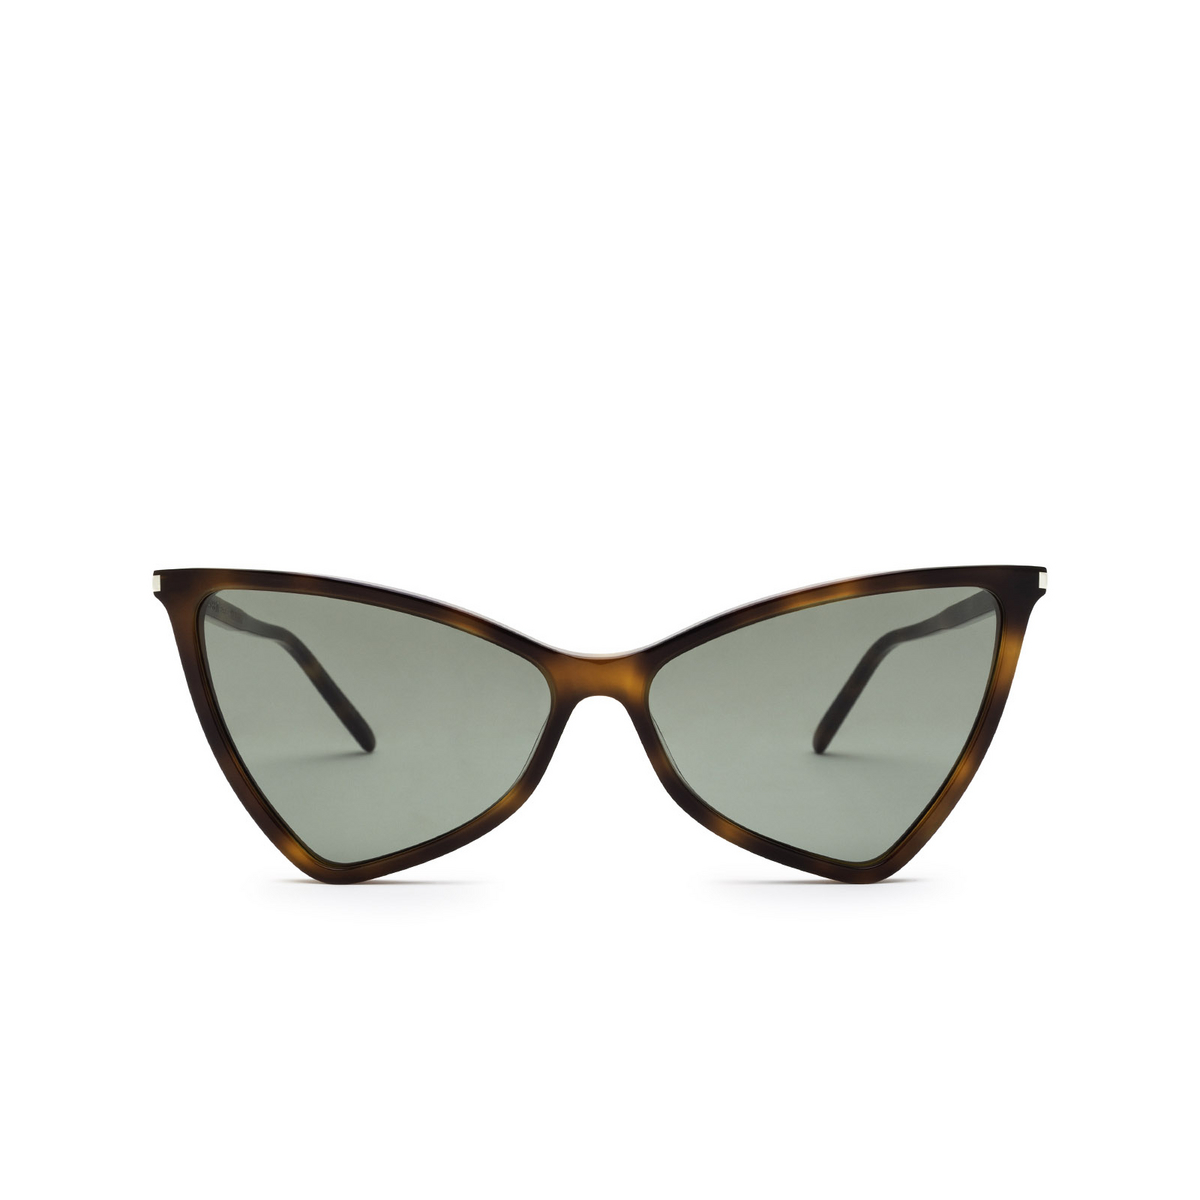 Saint Laurent® Irregular Sunglasses: Jerry SL 475 color Havana 002 - front view.